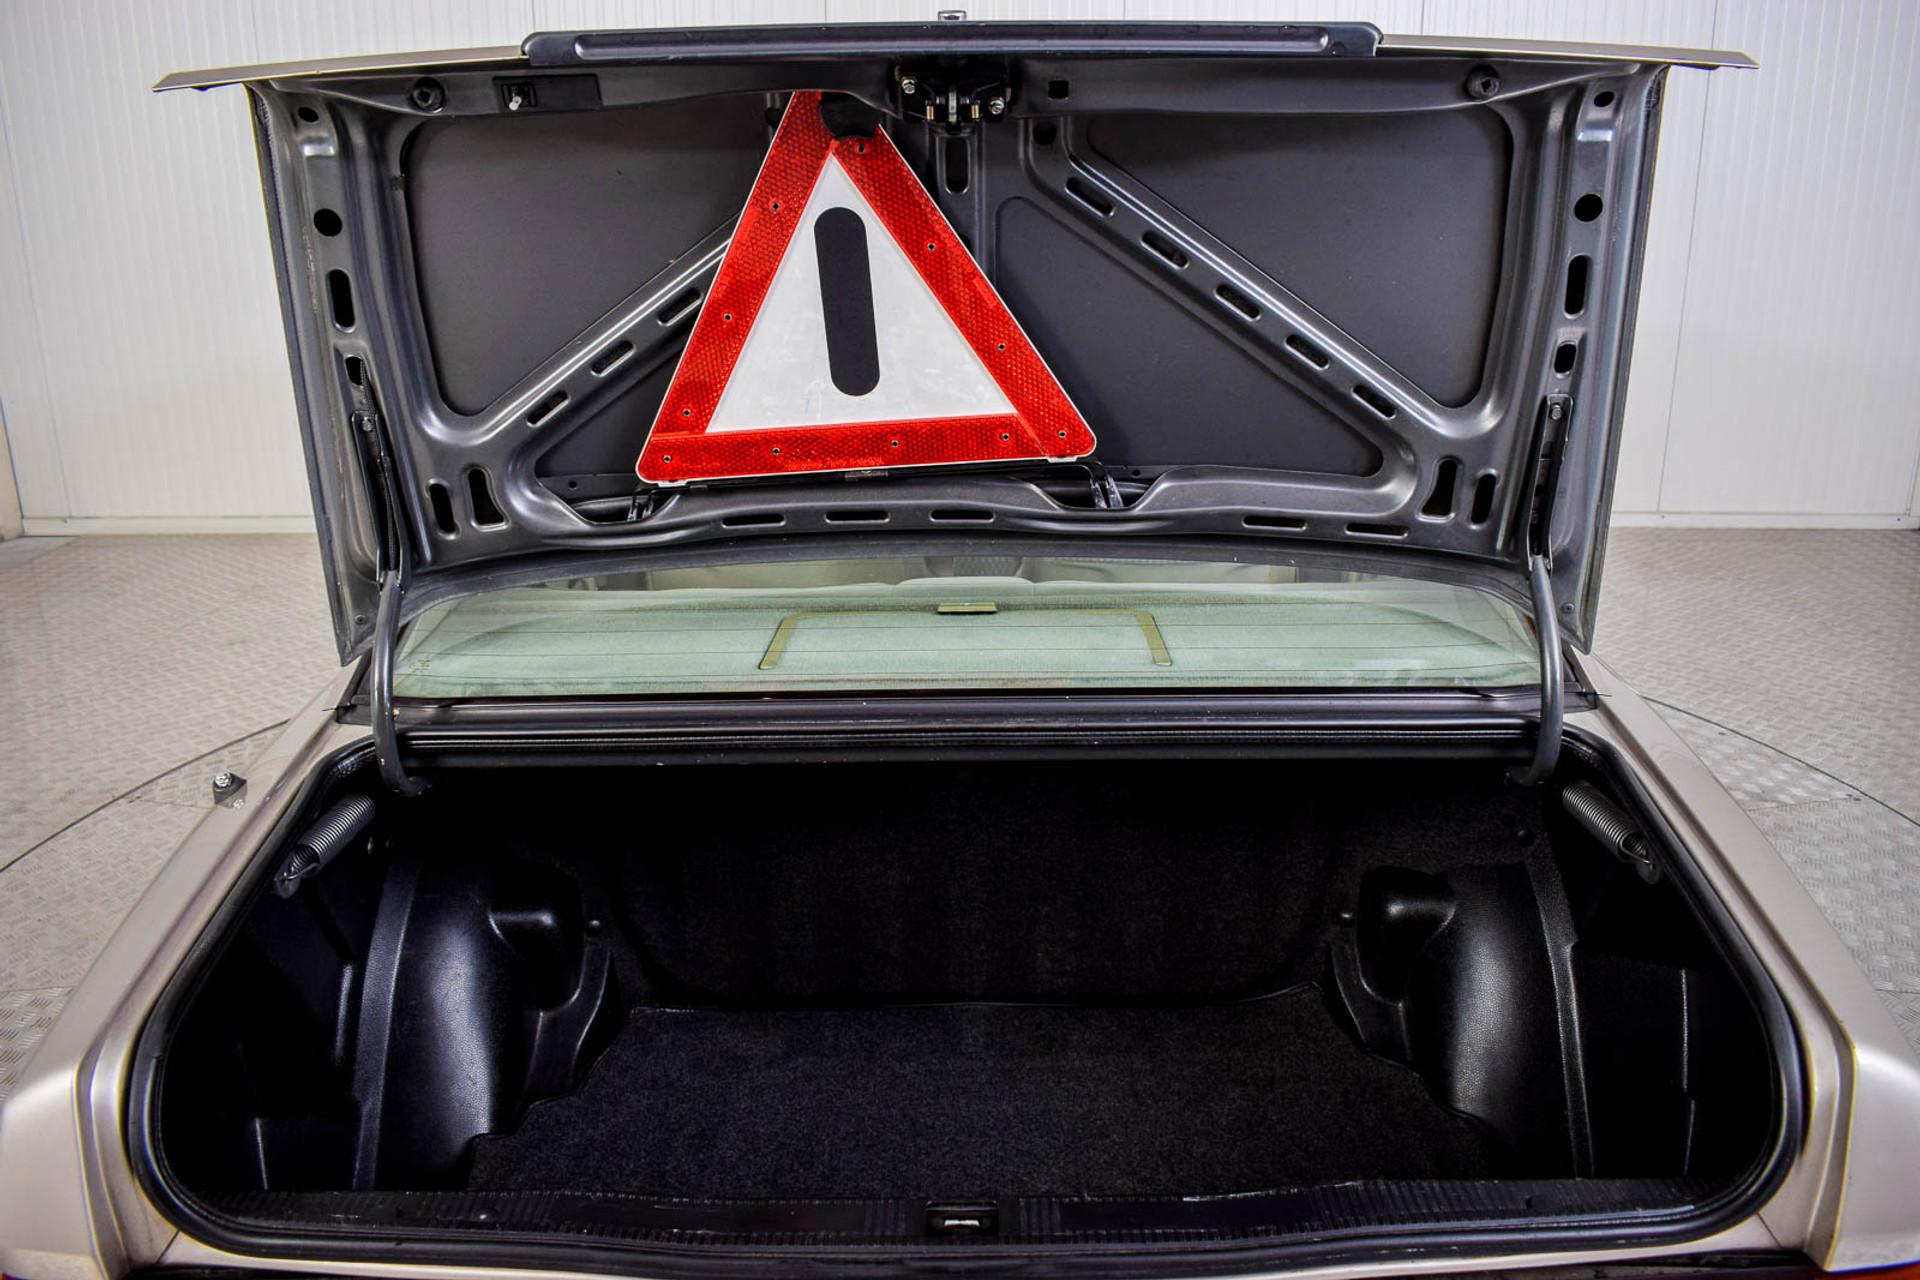 Mercedes-Benz 190 2.5 D Turbo Diesel Foto 30